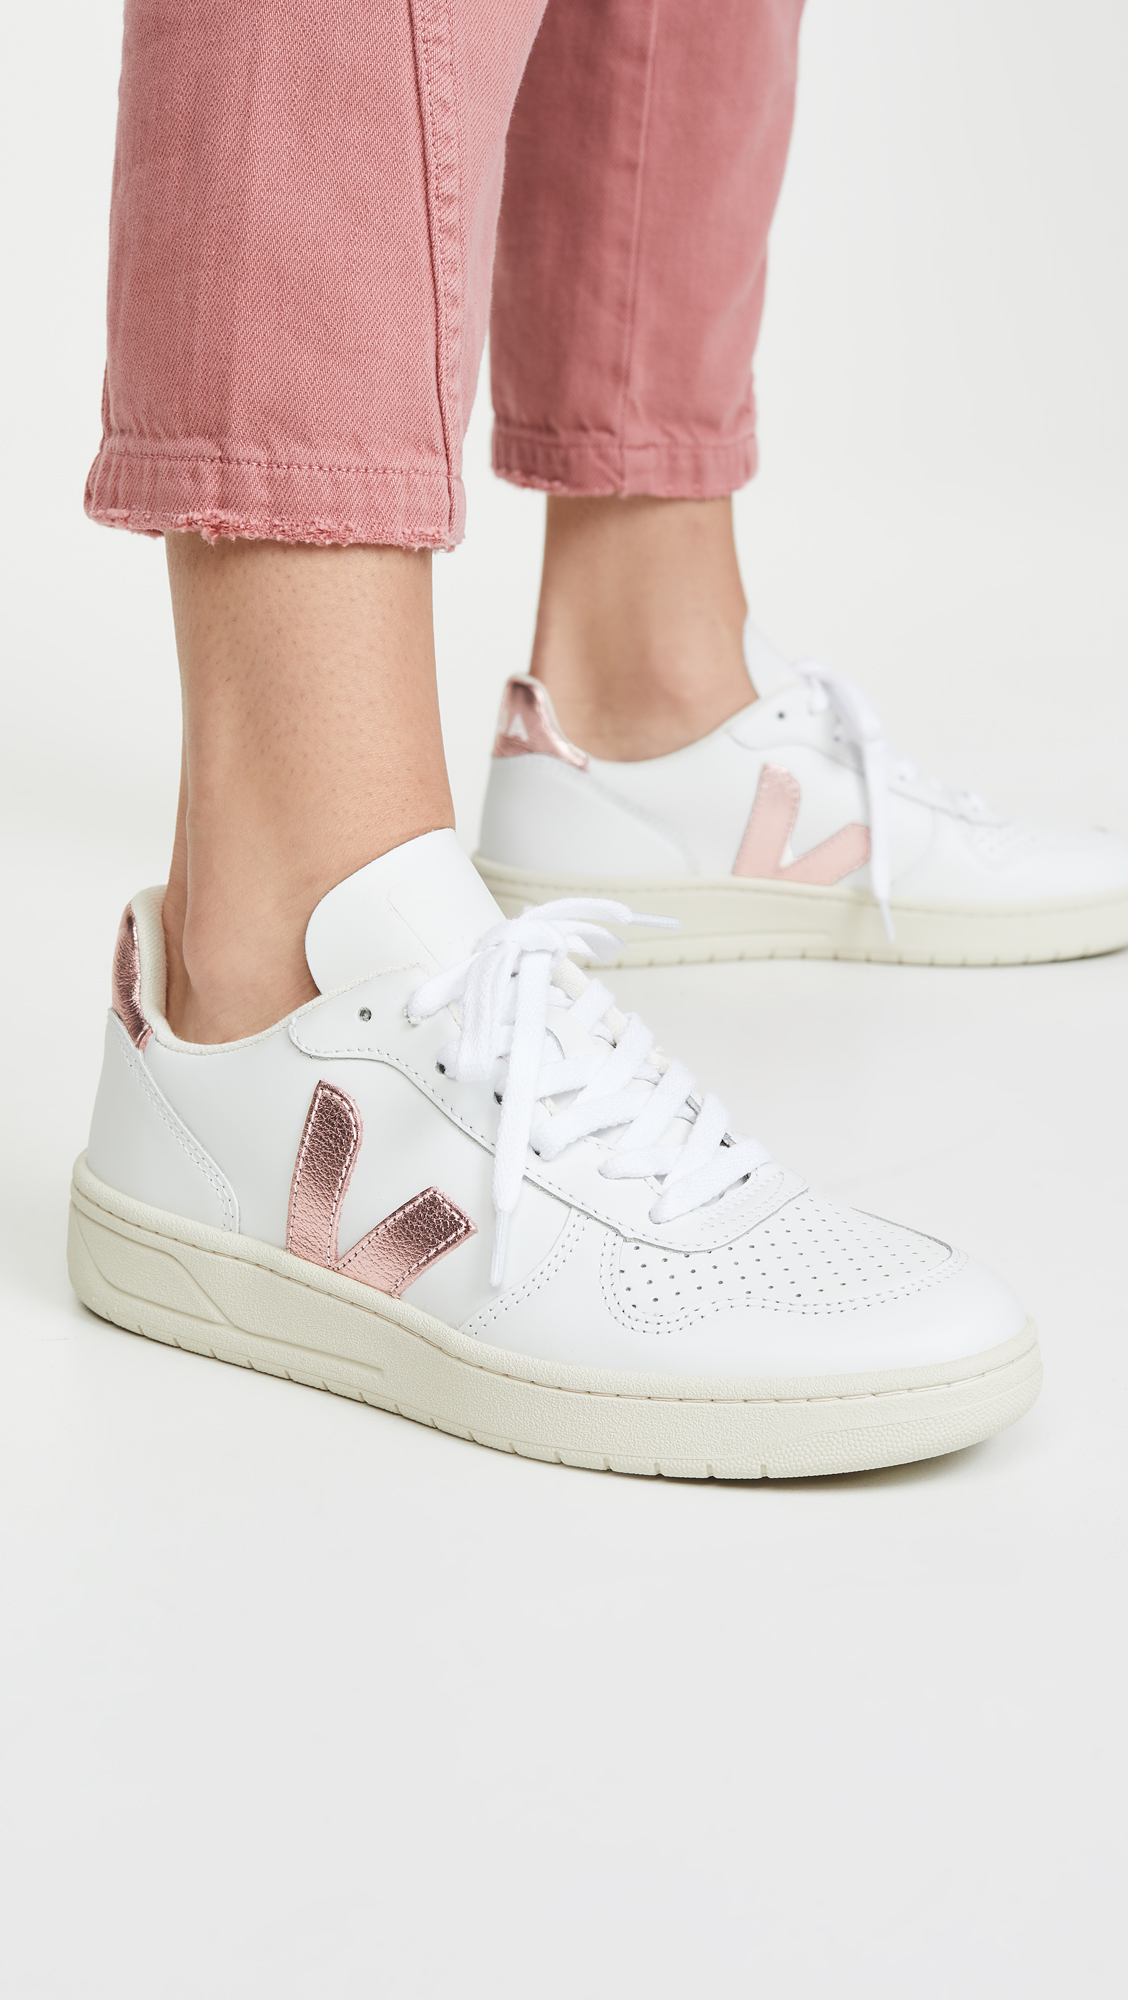 veja perforated toe sneakers order